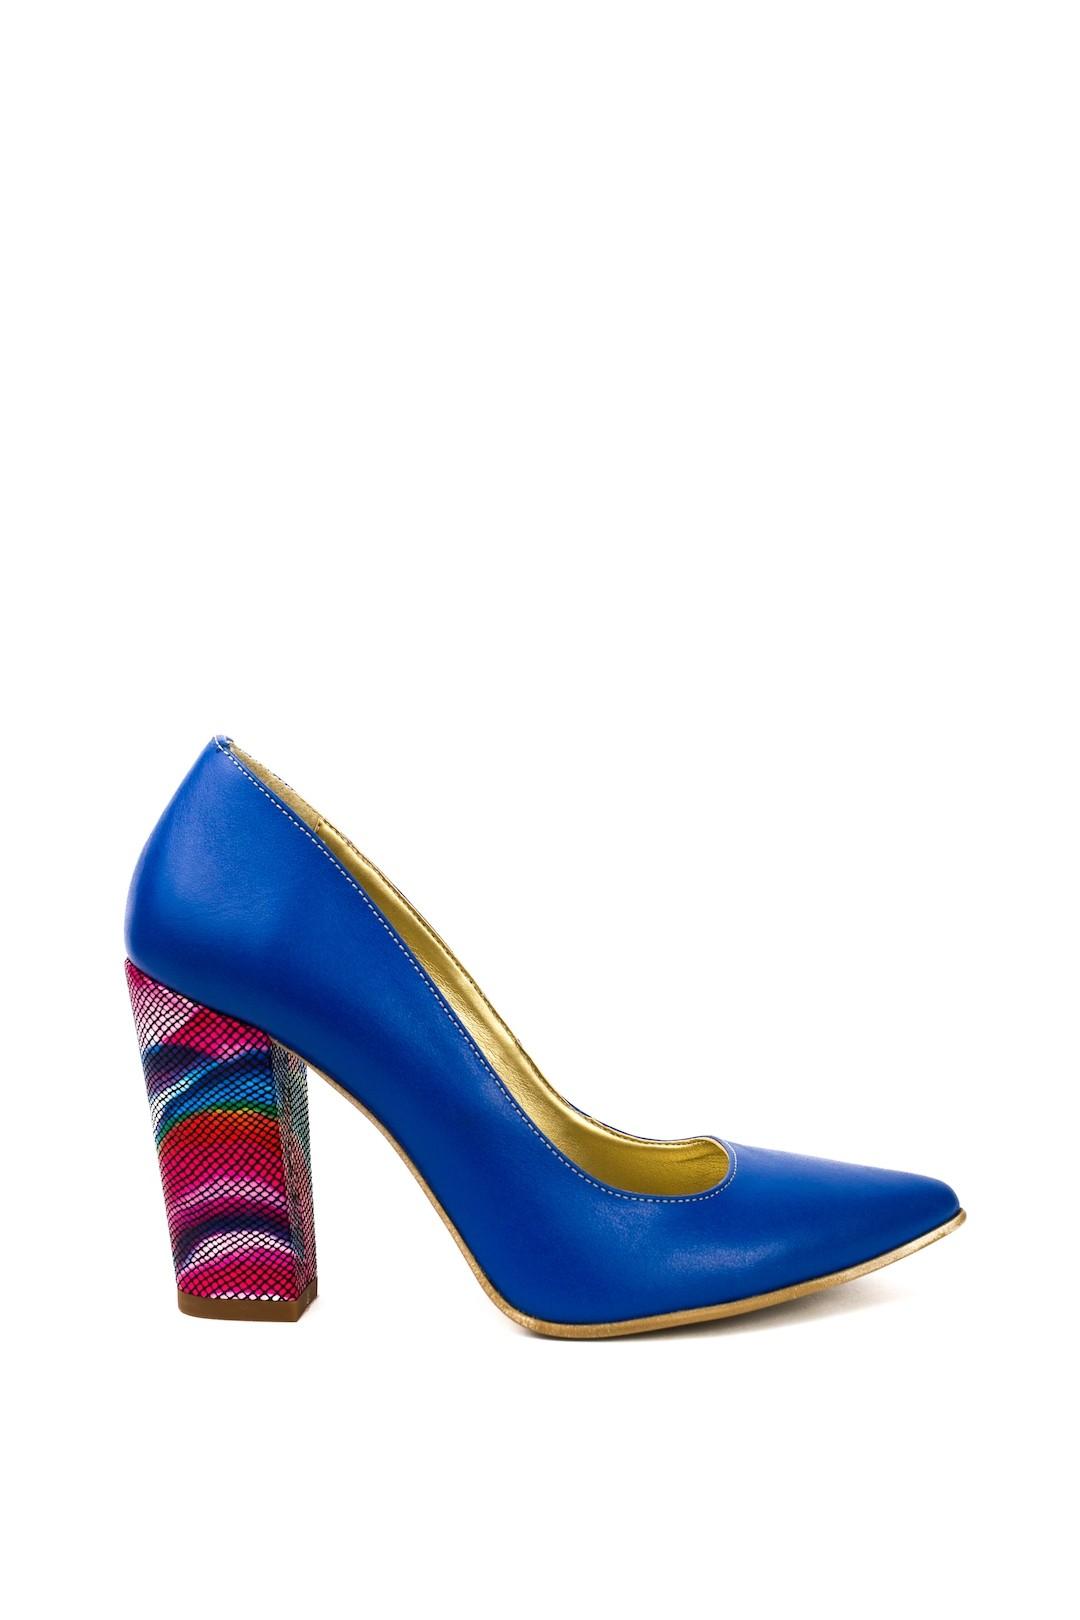 Pantofi Dama piele naturala albastru Sanziana